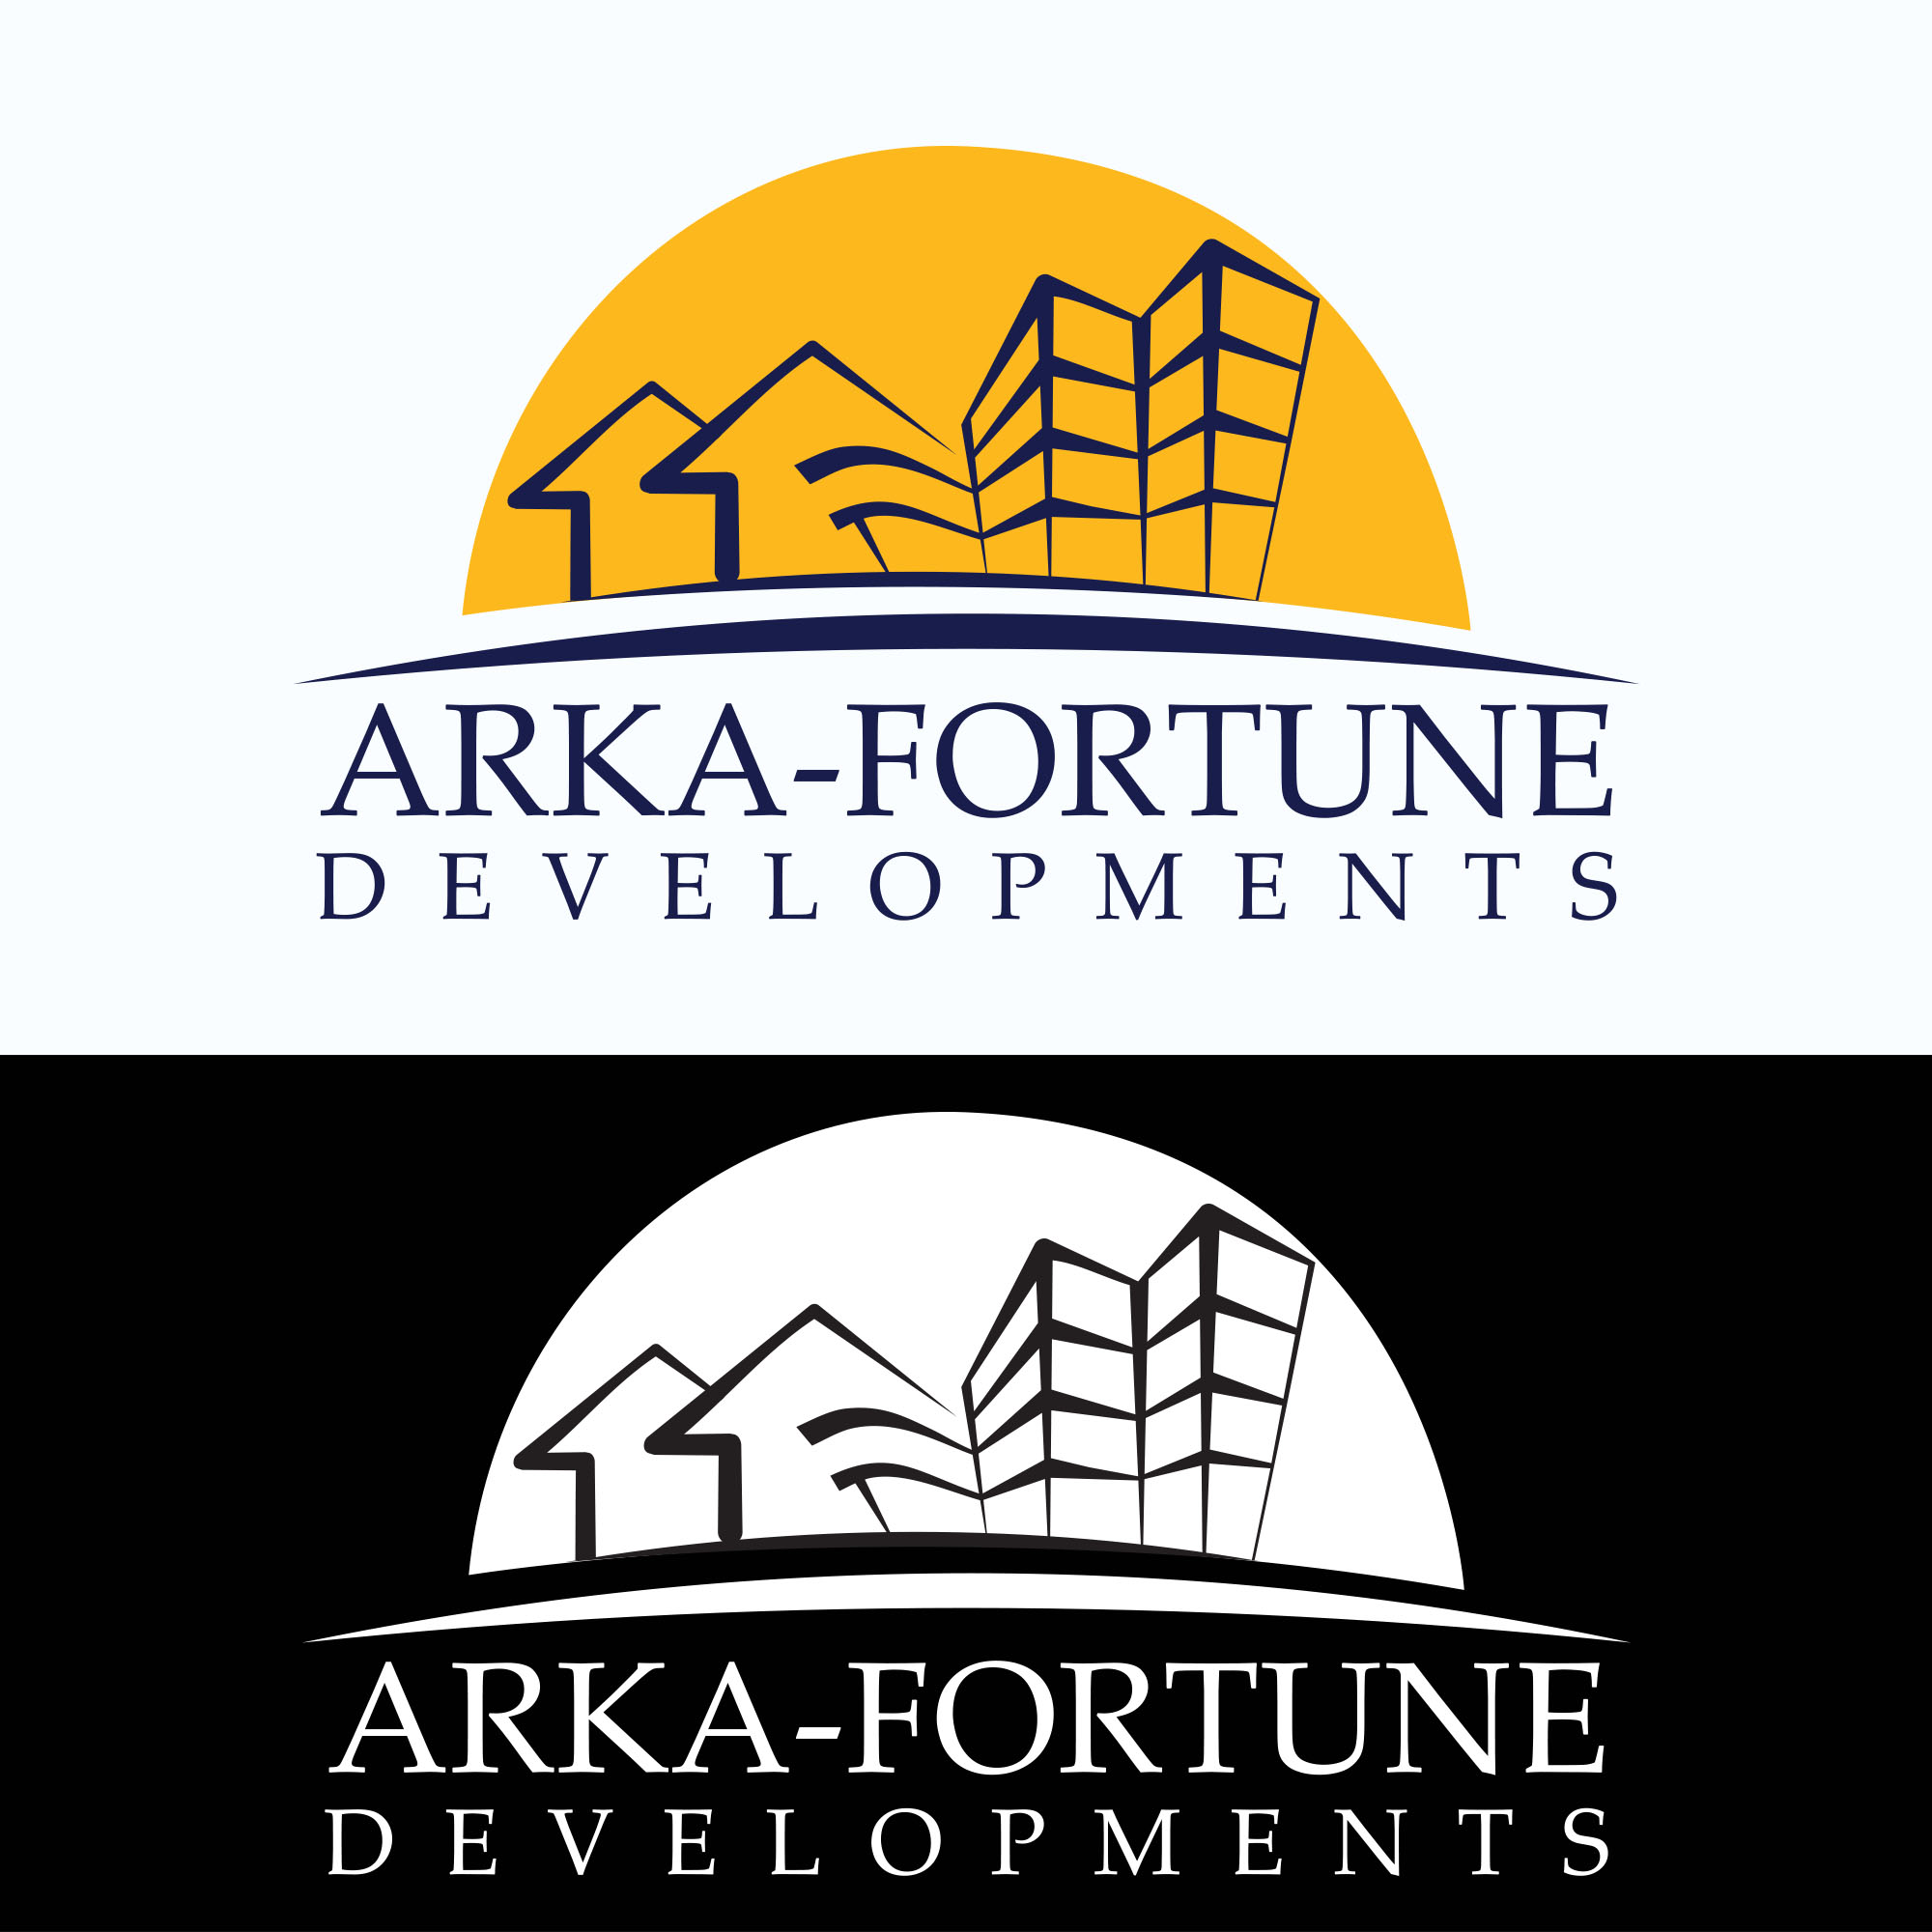 Logo Design by AKM Fazley Rabbi Faruque - Entry No. 89 in the Logo Design Contest Arka-Fortune Developments Logo Design.